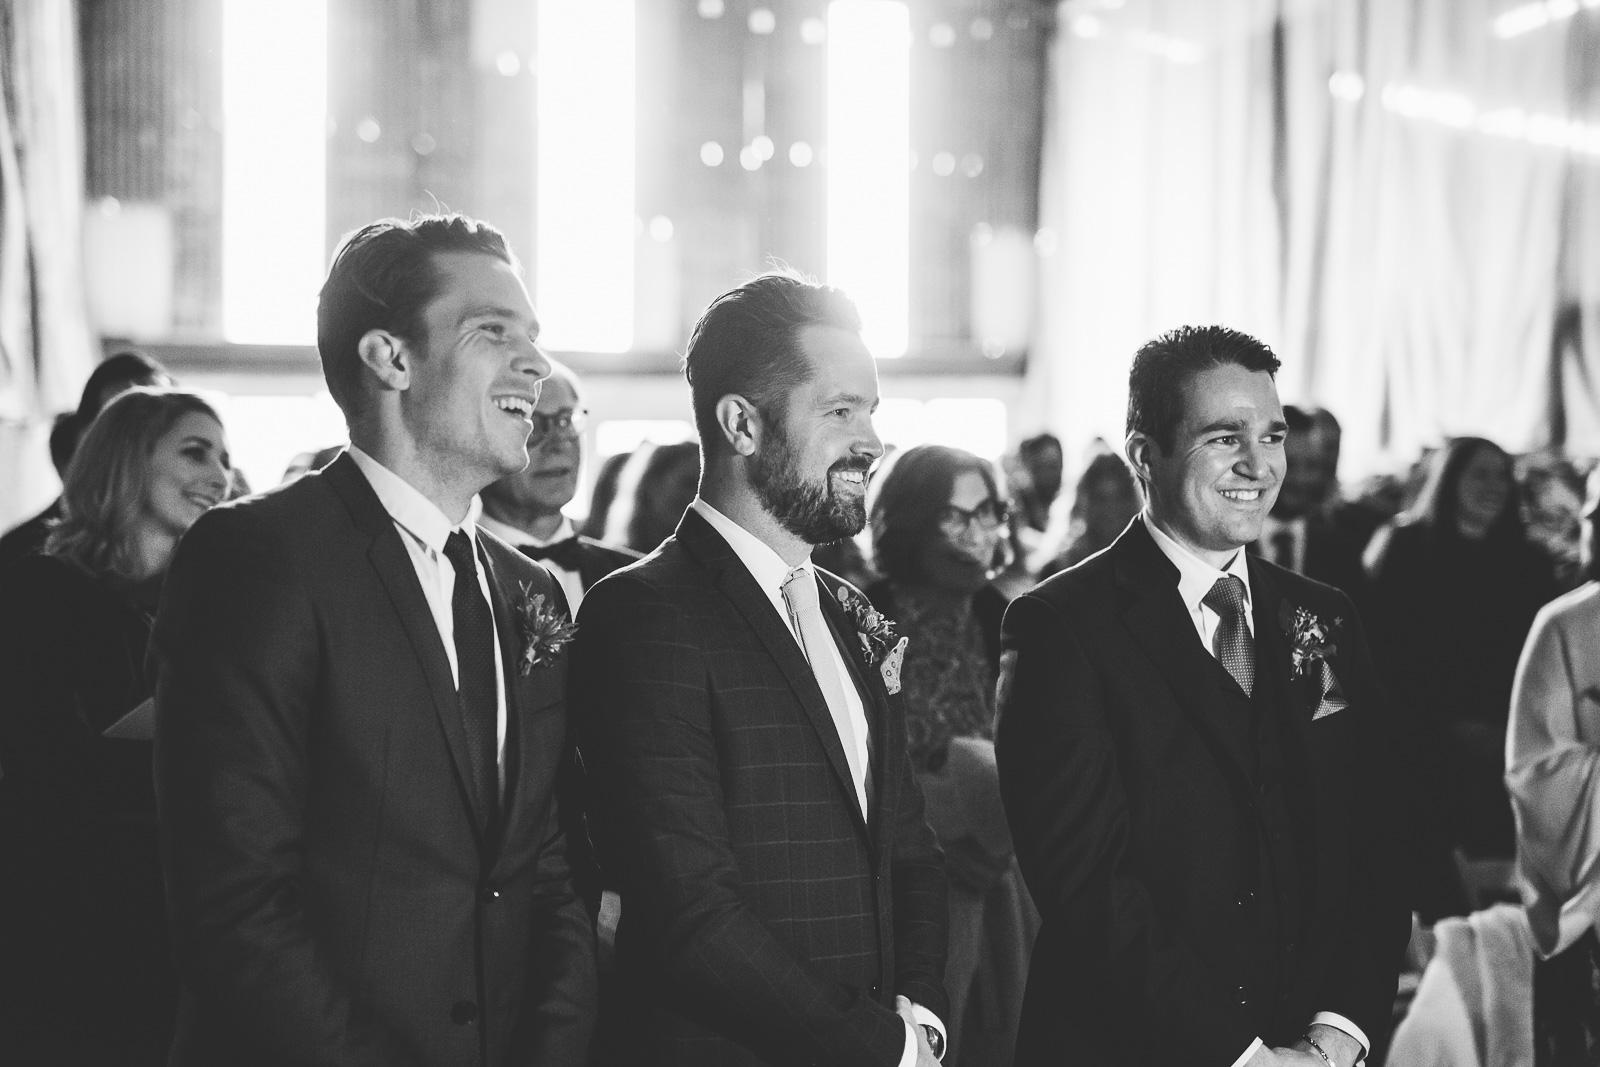 Cloughjordan+Weddings+Ireland.26.JPG